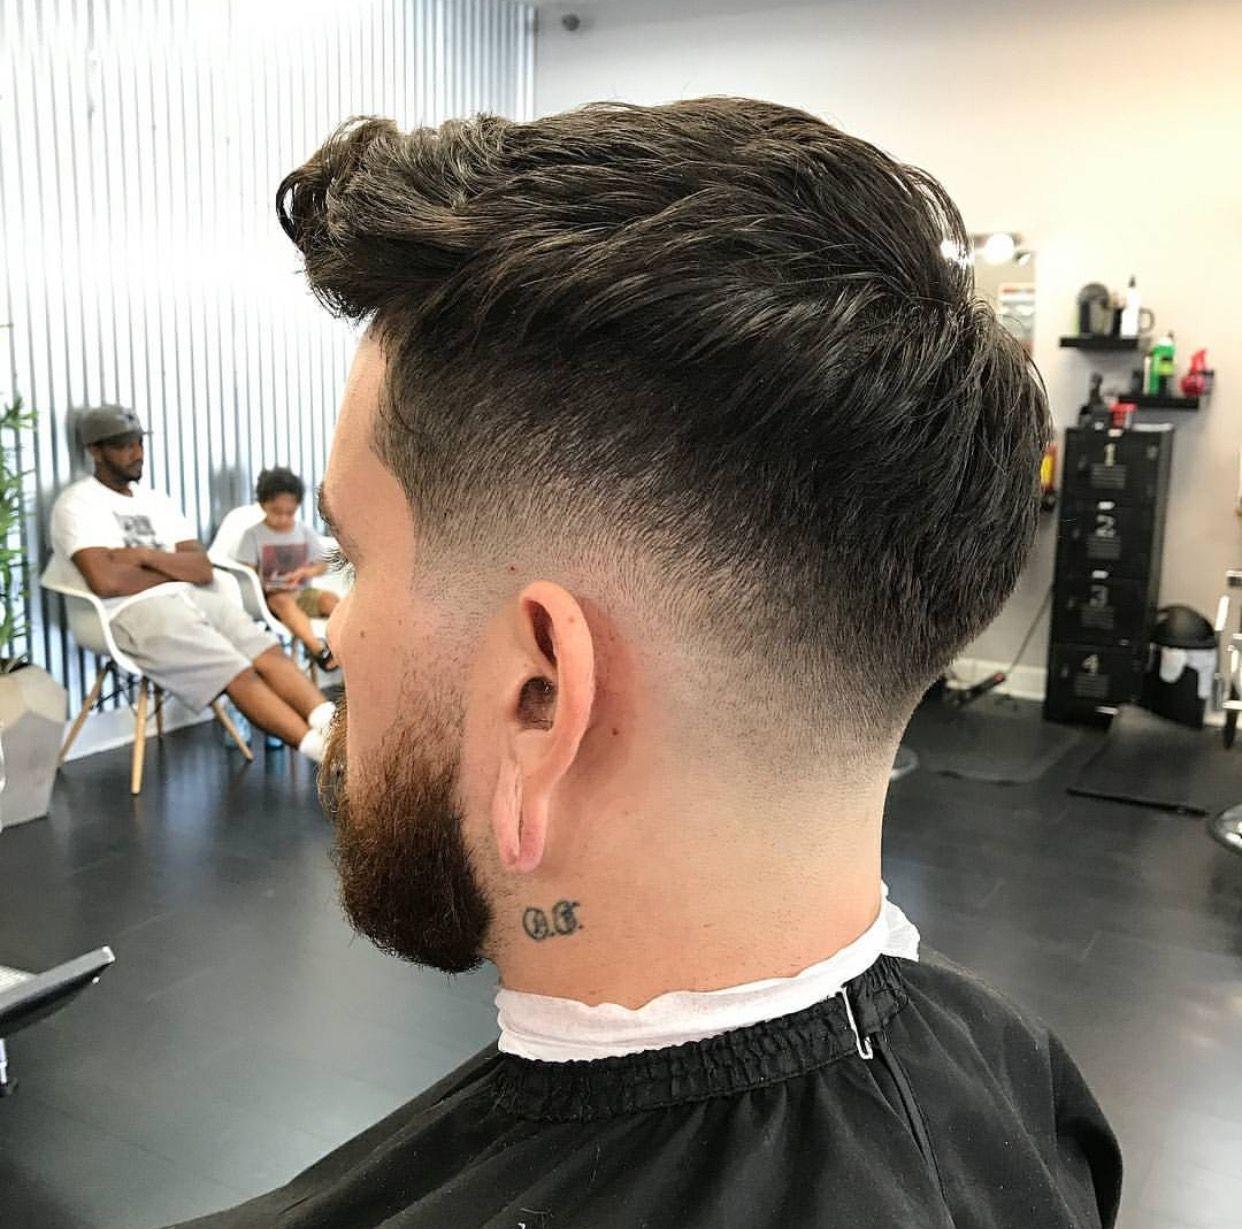 Boy hair style cutting pin by luisa fernanda puerta lópez on haircut  pinterest  haircuts